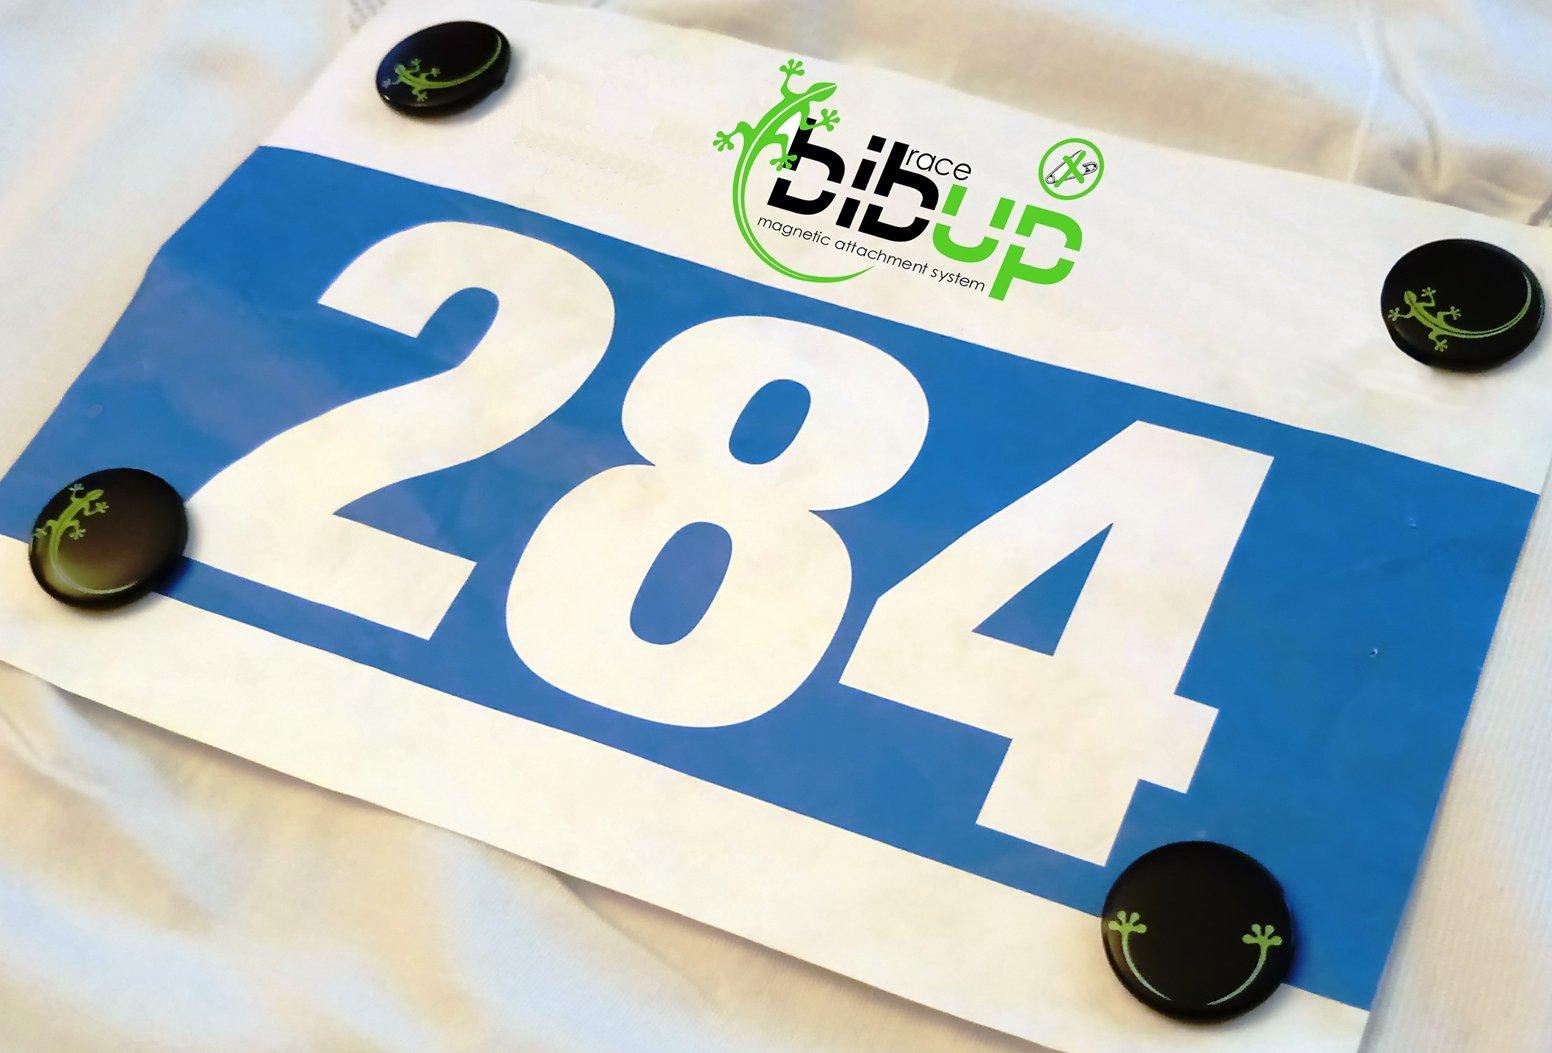 pettorale-racebibup-magnets-hold-support-bib-number-bibup-2.jpg